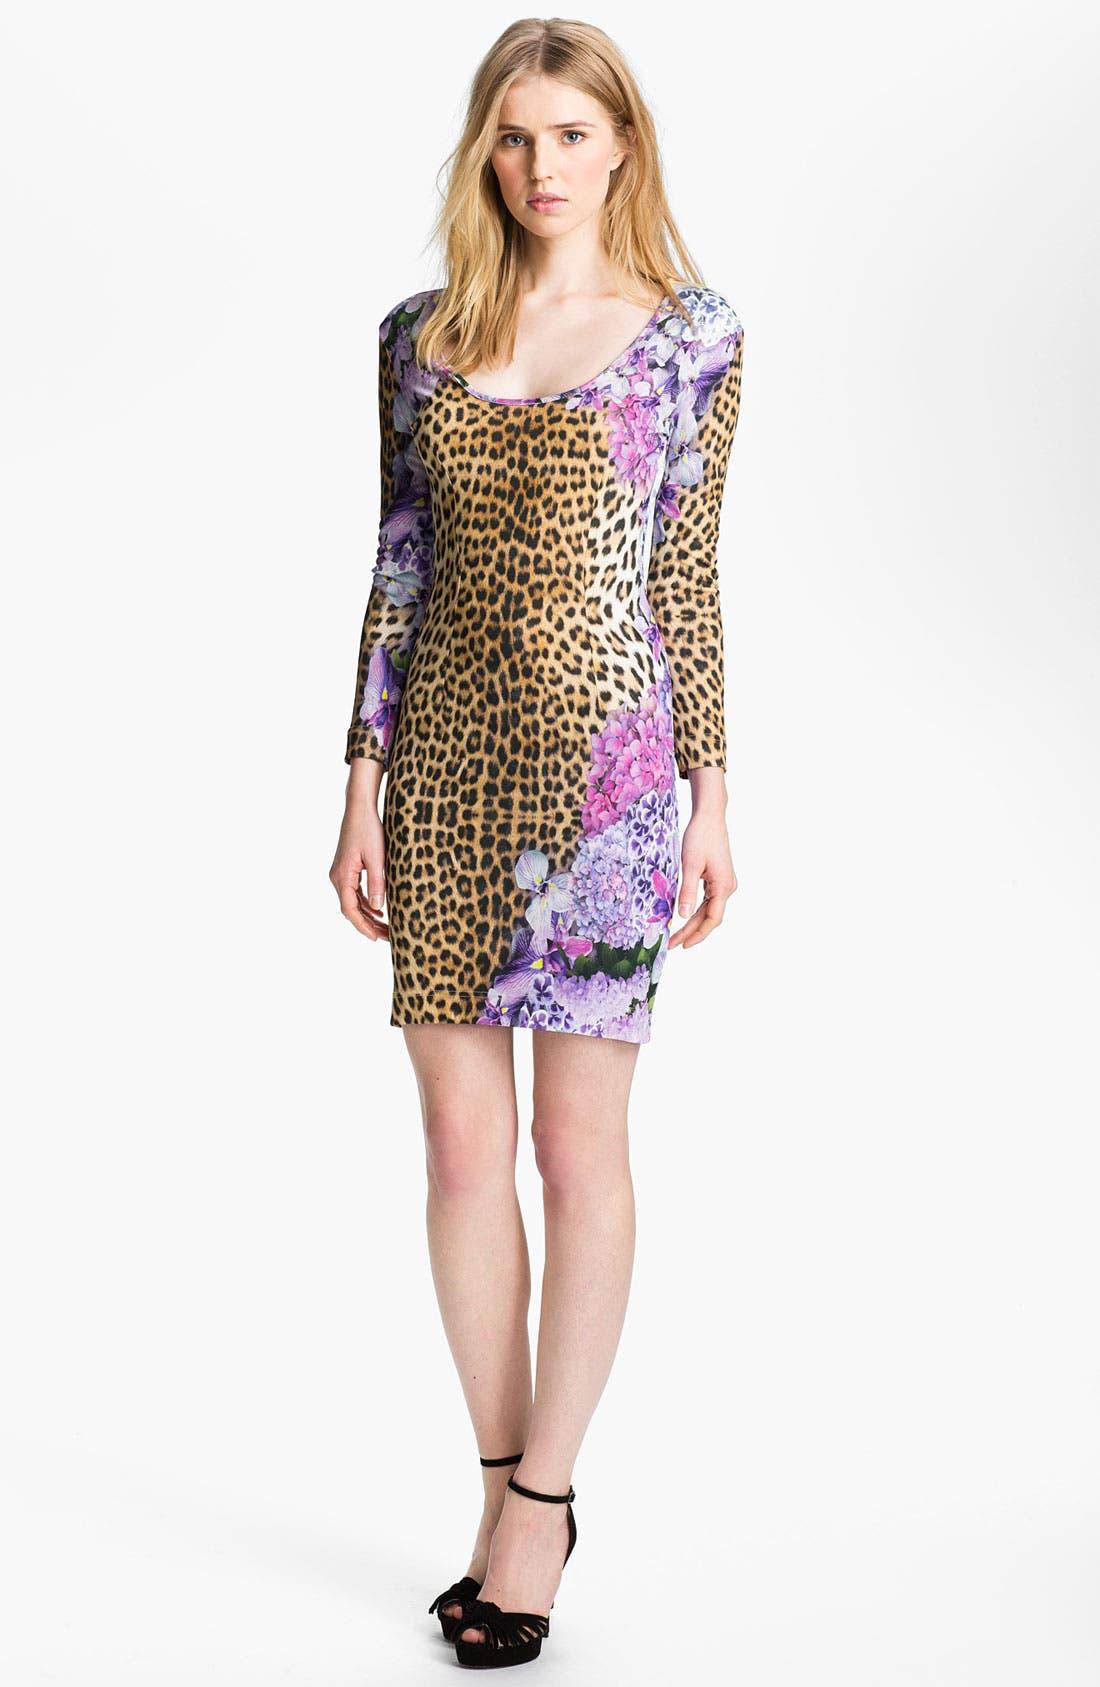 Main Image - Just Cavalli Leopard & Floral Print Jersey Dress